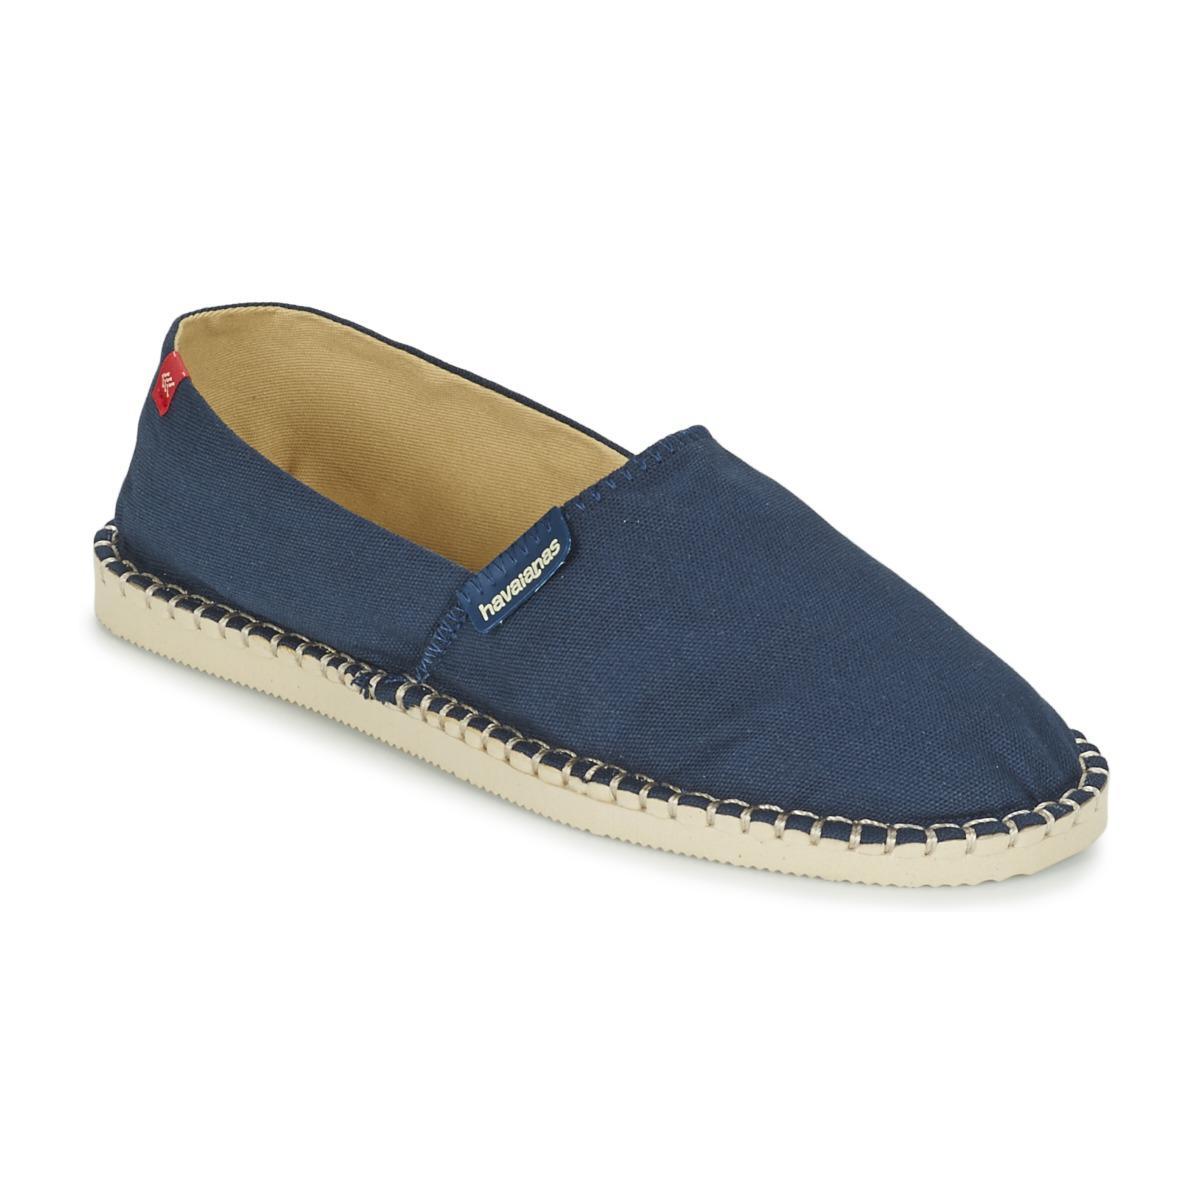 8142317b46 Havaianas Origine Iii Men s Espadrilles   Casual Shoes In Blue in ...